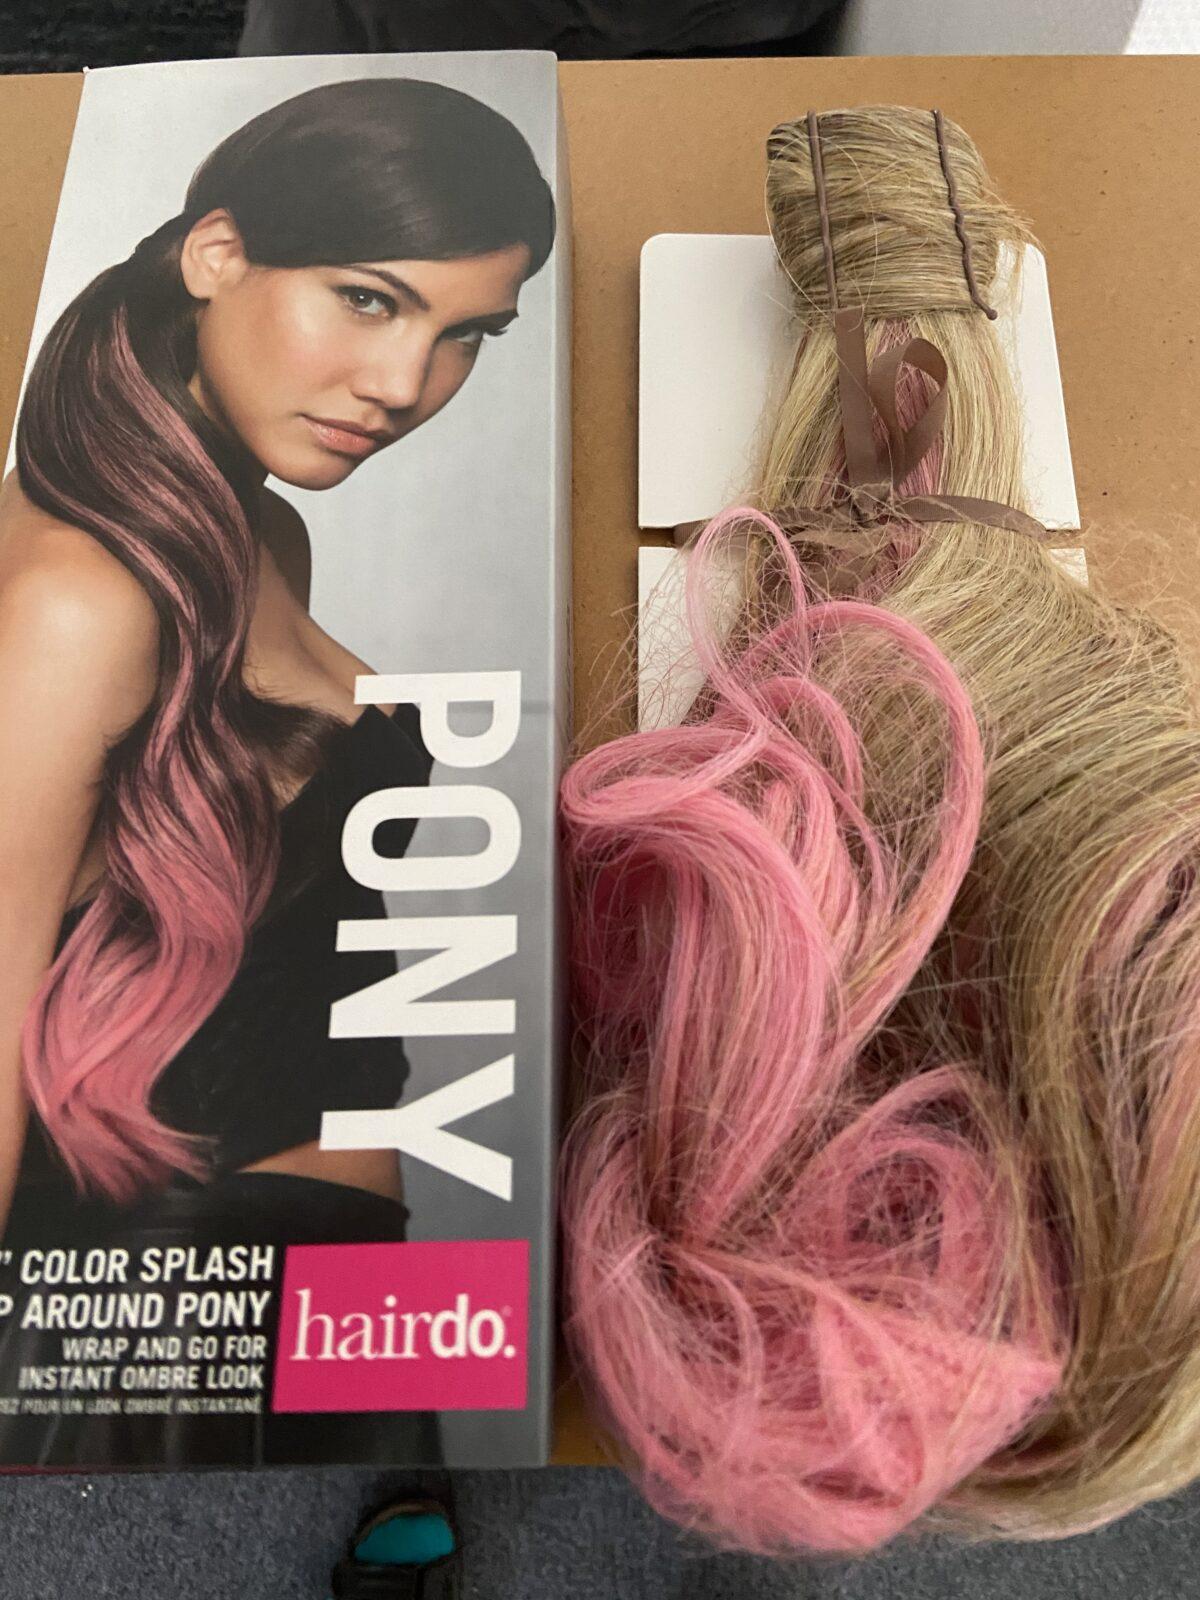 Color Splash Wrap Around Pony Godblond-Mix - Pink